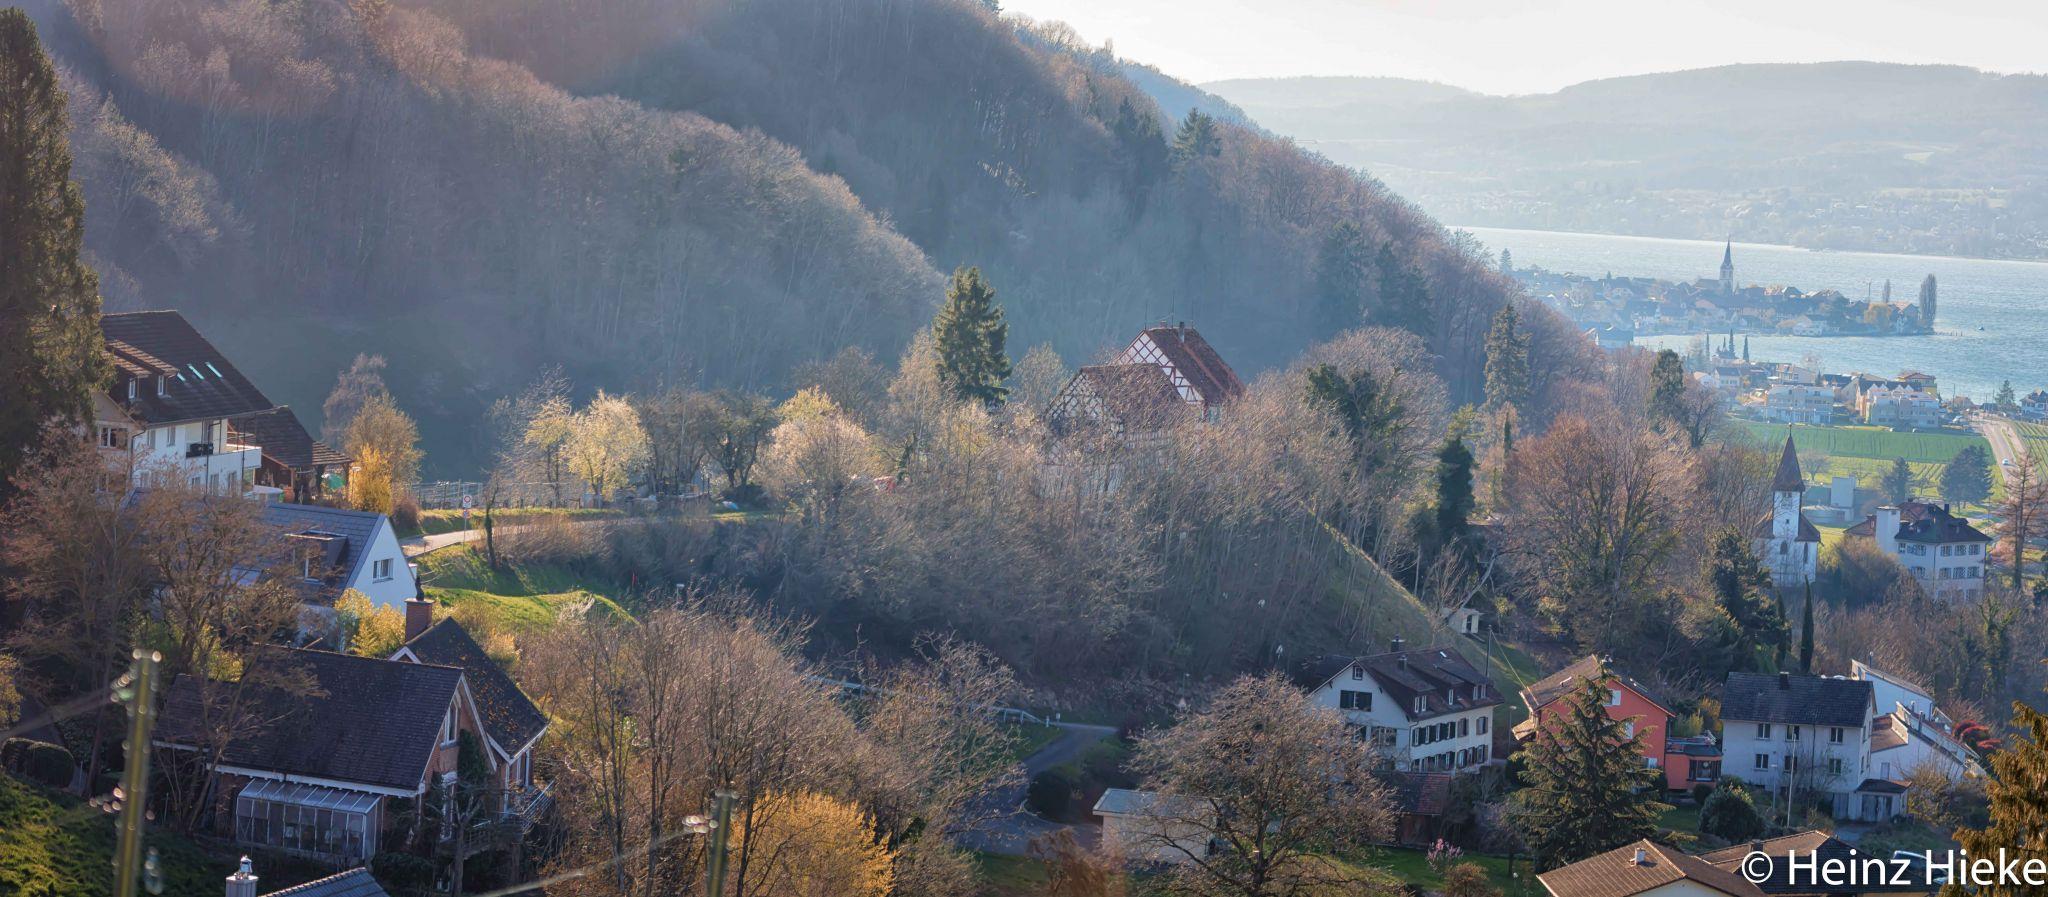 Galgenhügel, Switzerland